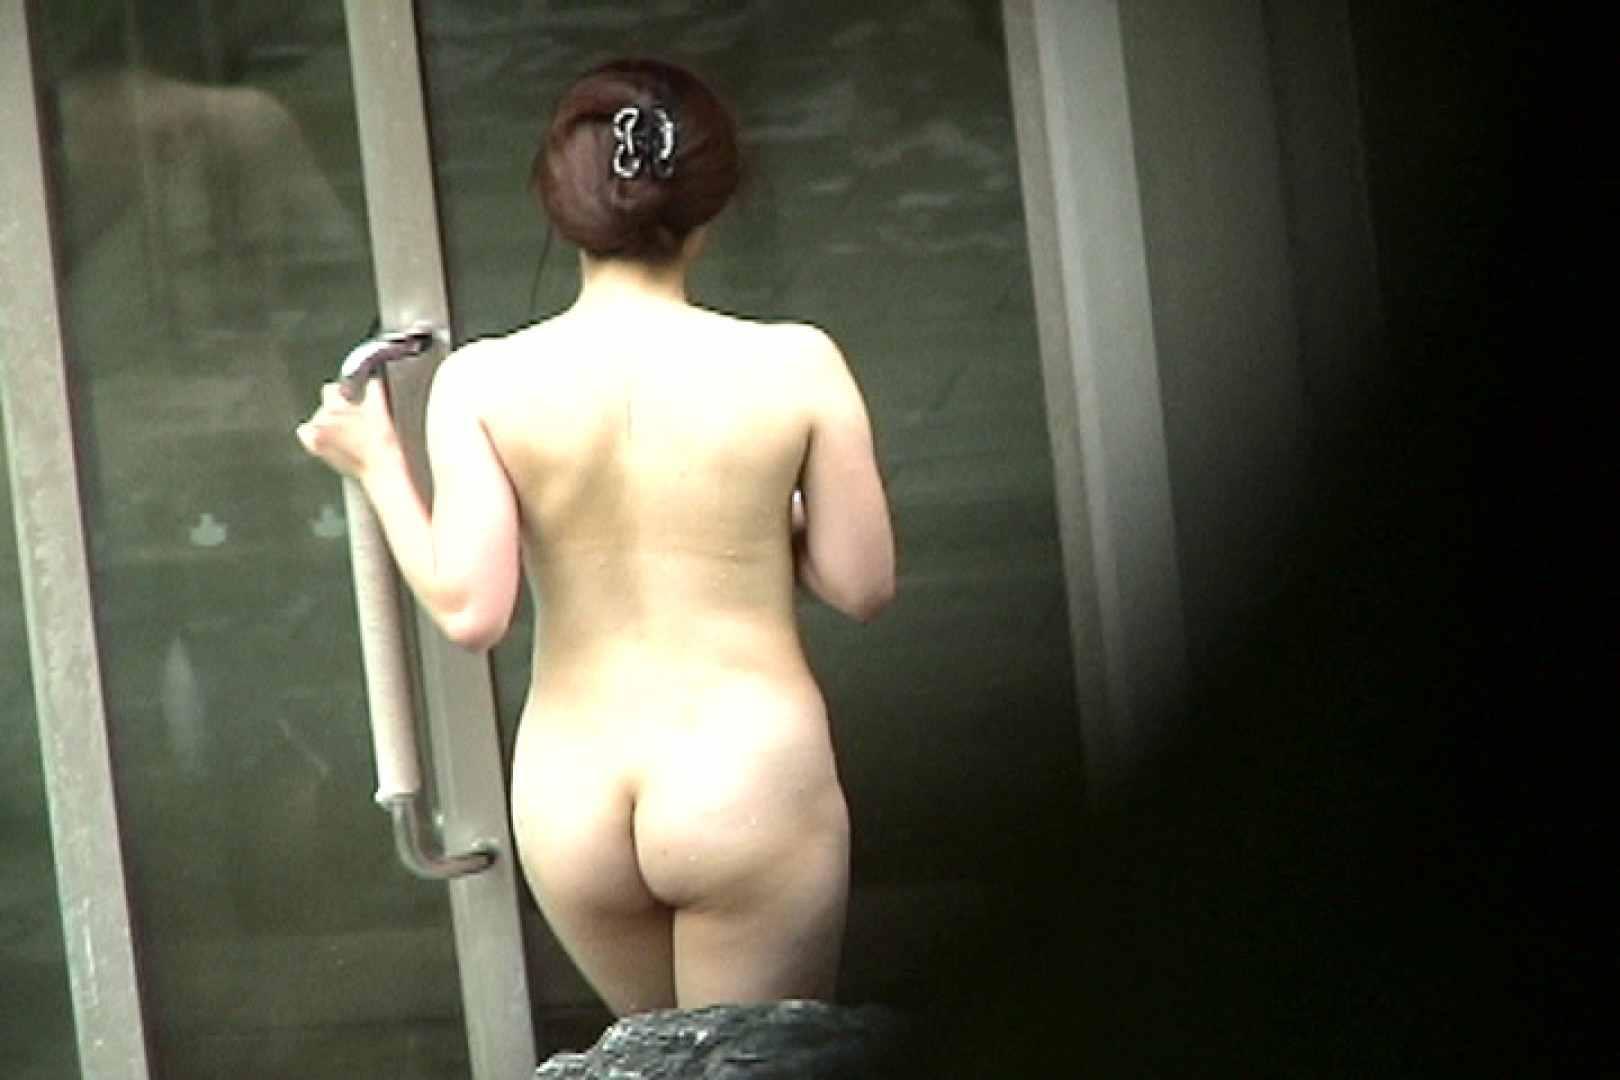 Aquaな露天風呂Vol.707 盗撮大放出 セックス無修正動画無料 34連発 11